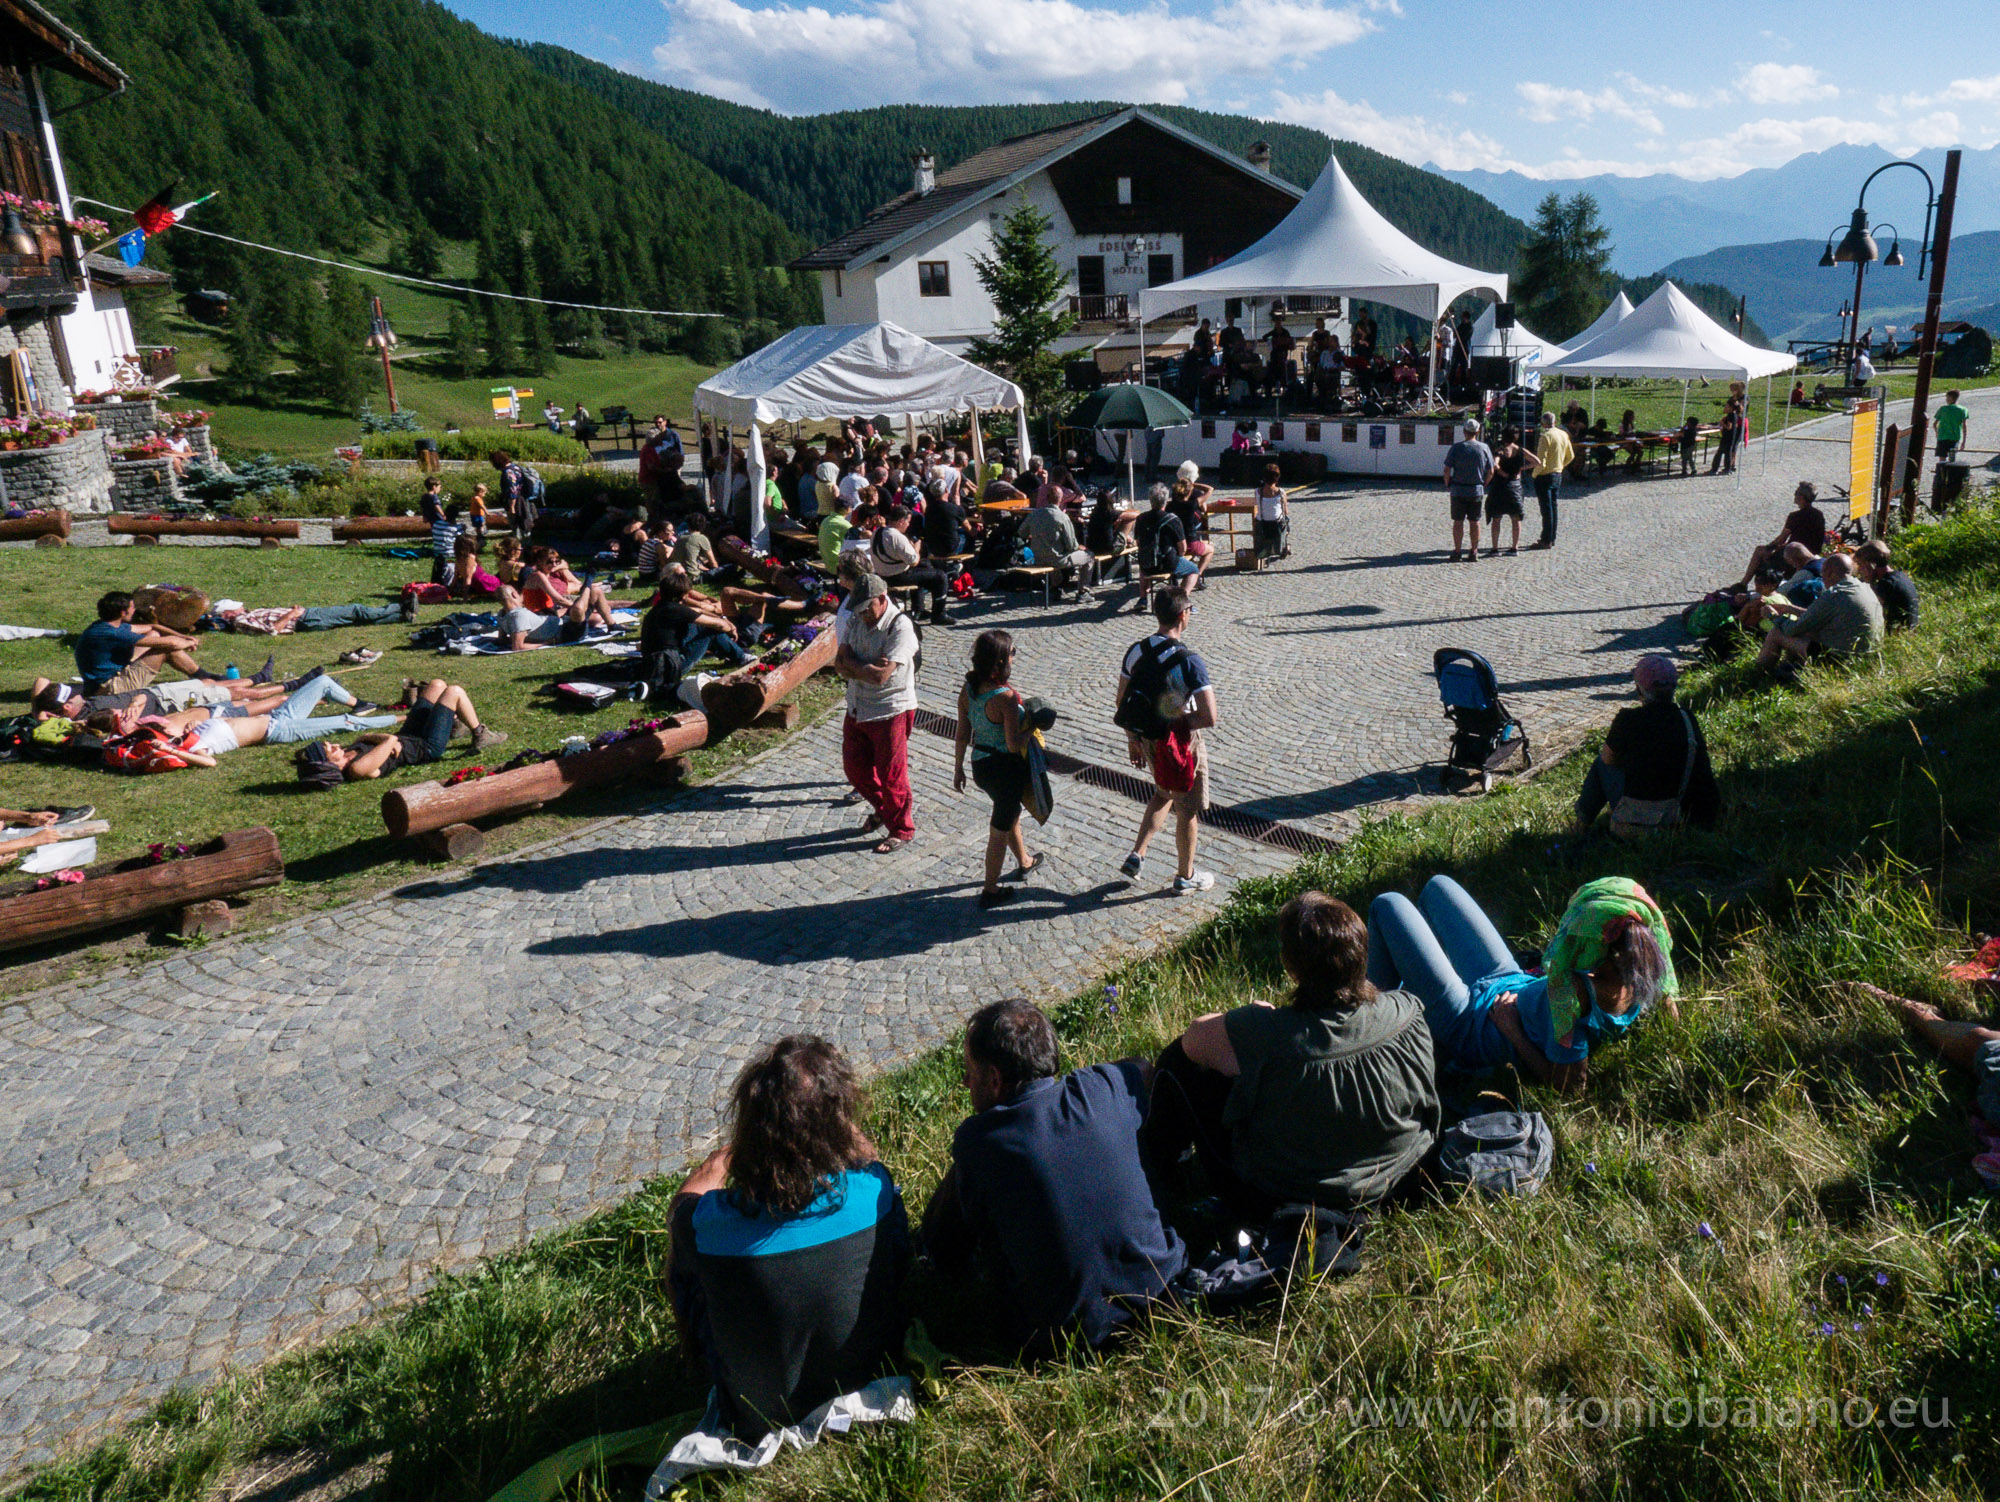 Chamoisic Festival 2017; Chamois, Valle D'Aosta, Italy